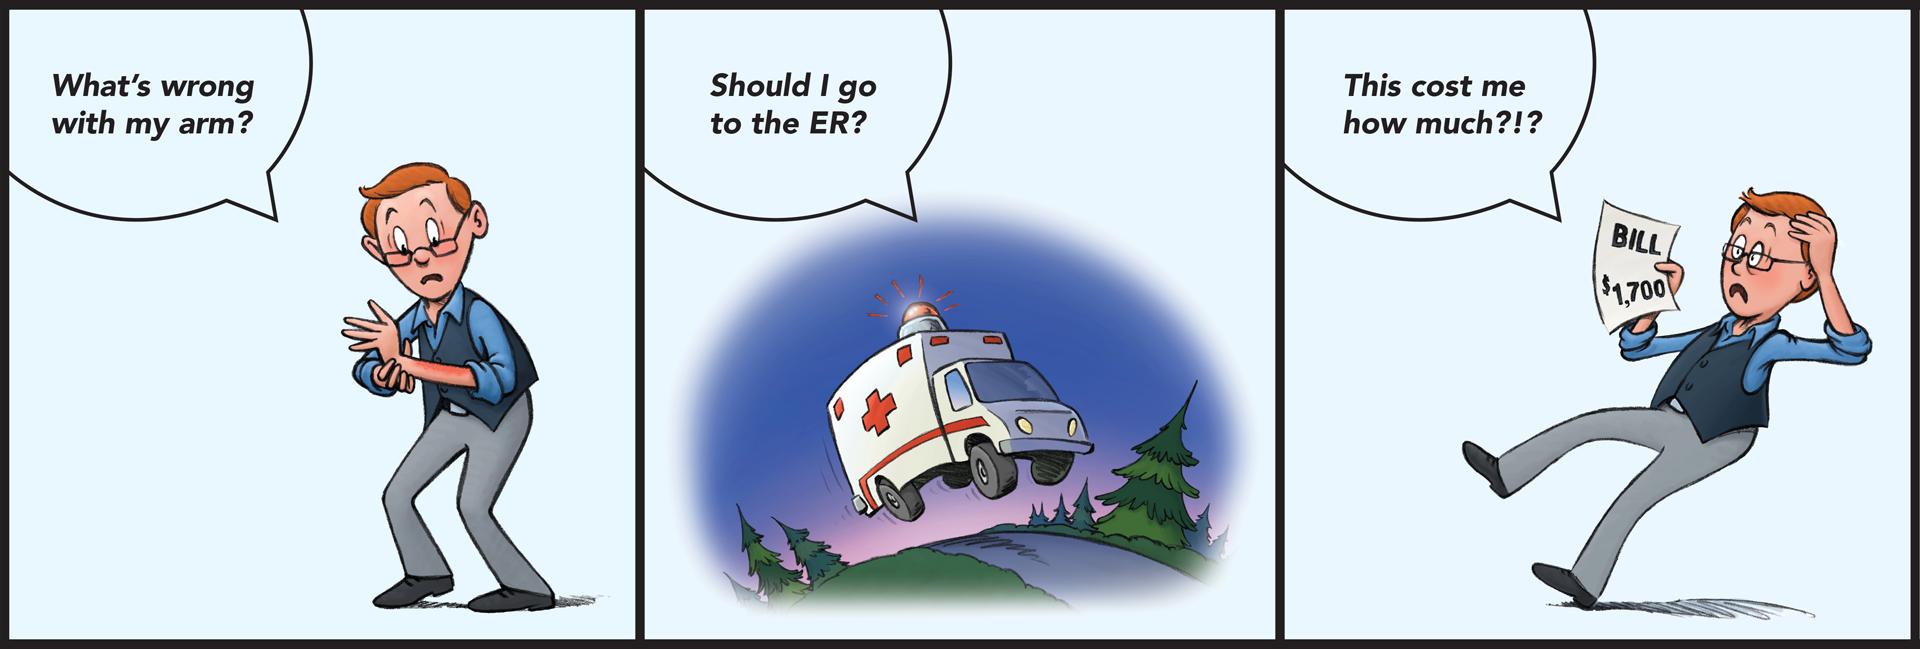 find the right care comic